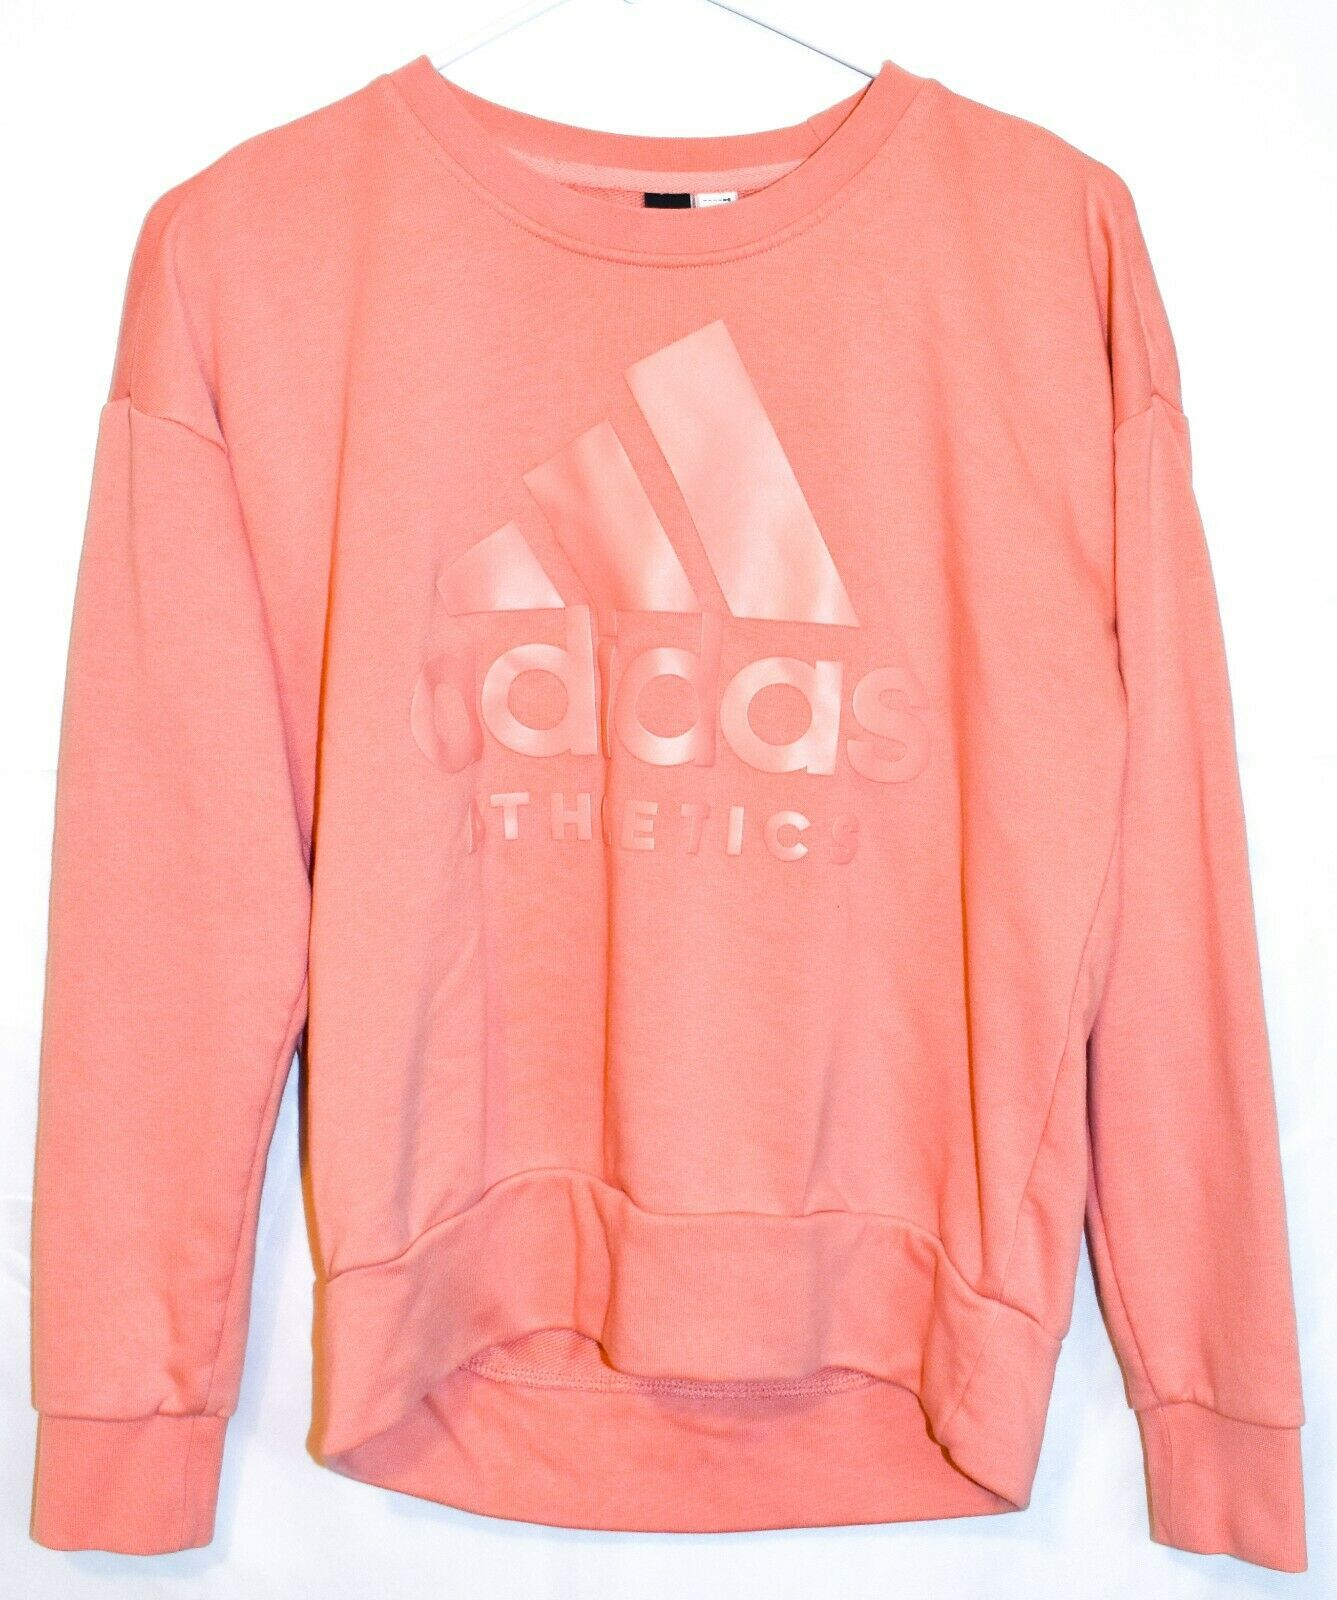 Adidas Athletics Women's Peach Pink Pullover Sweatshirt Size S A2B010